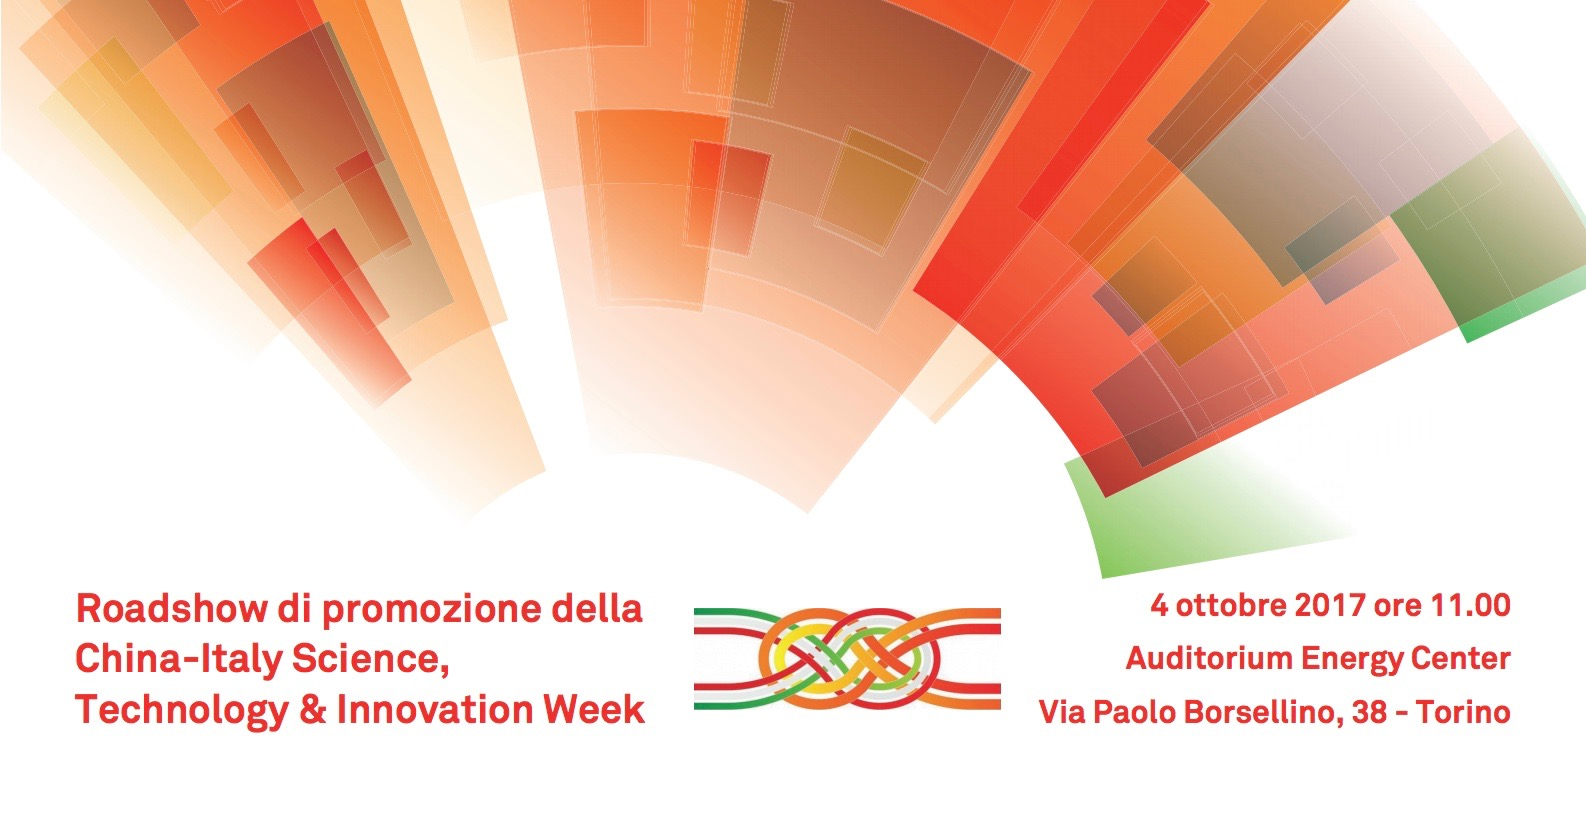 China-Italy Science, Technology & Innovation Week: il 4 ottobre a Torino il roadshow illustrativo